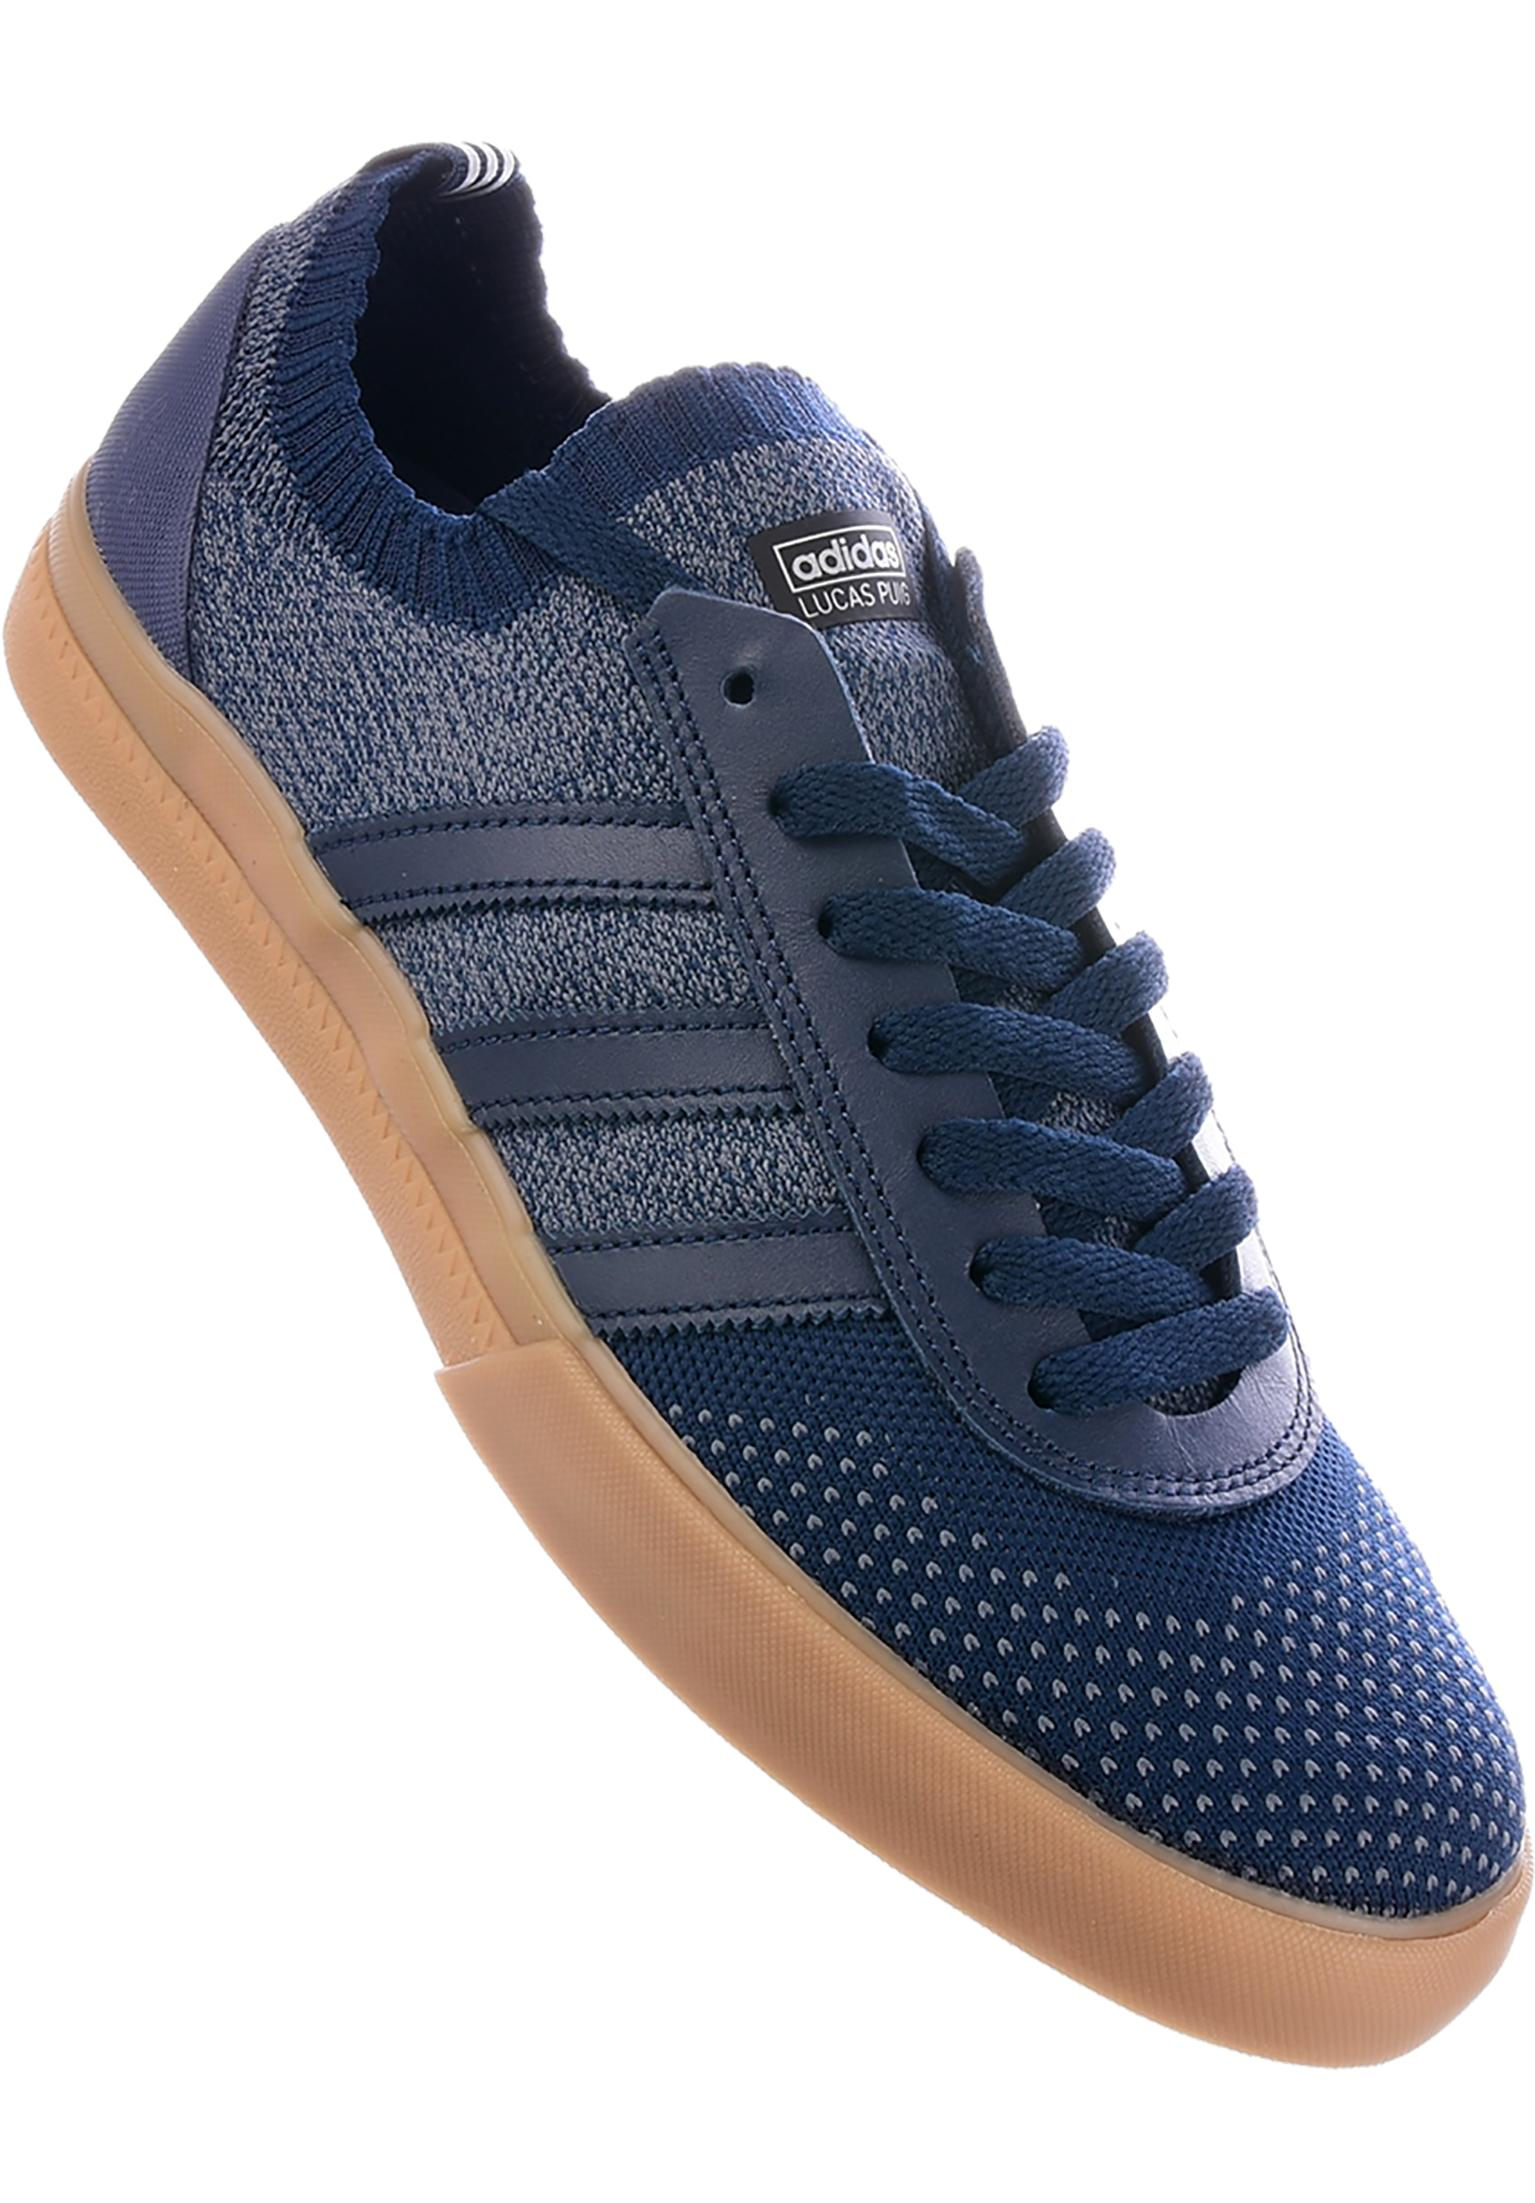 adidas Online Shop Lucas Premiere Primeknit Schuhe (Herren